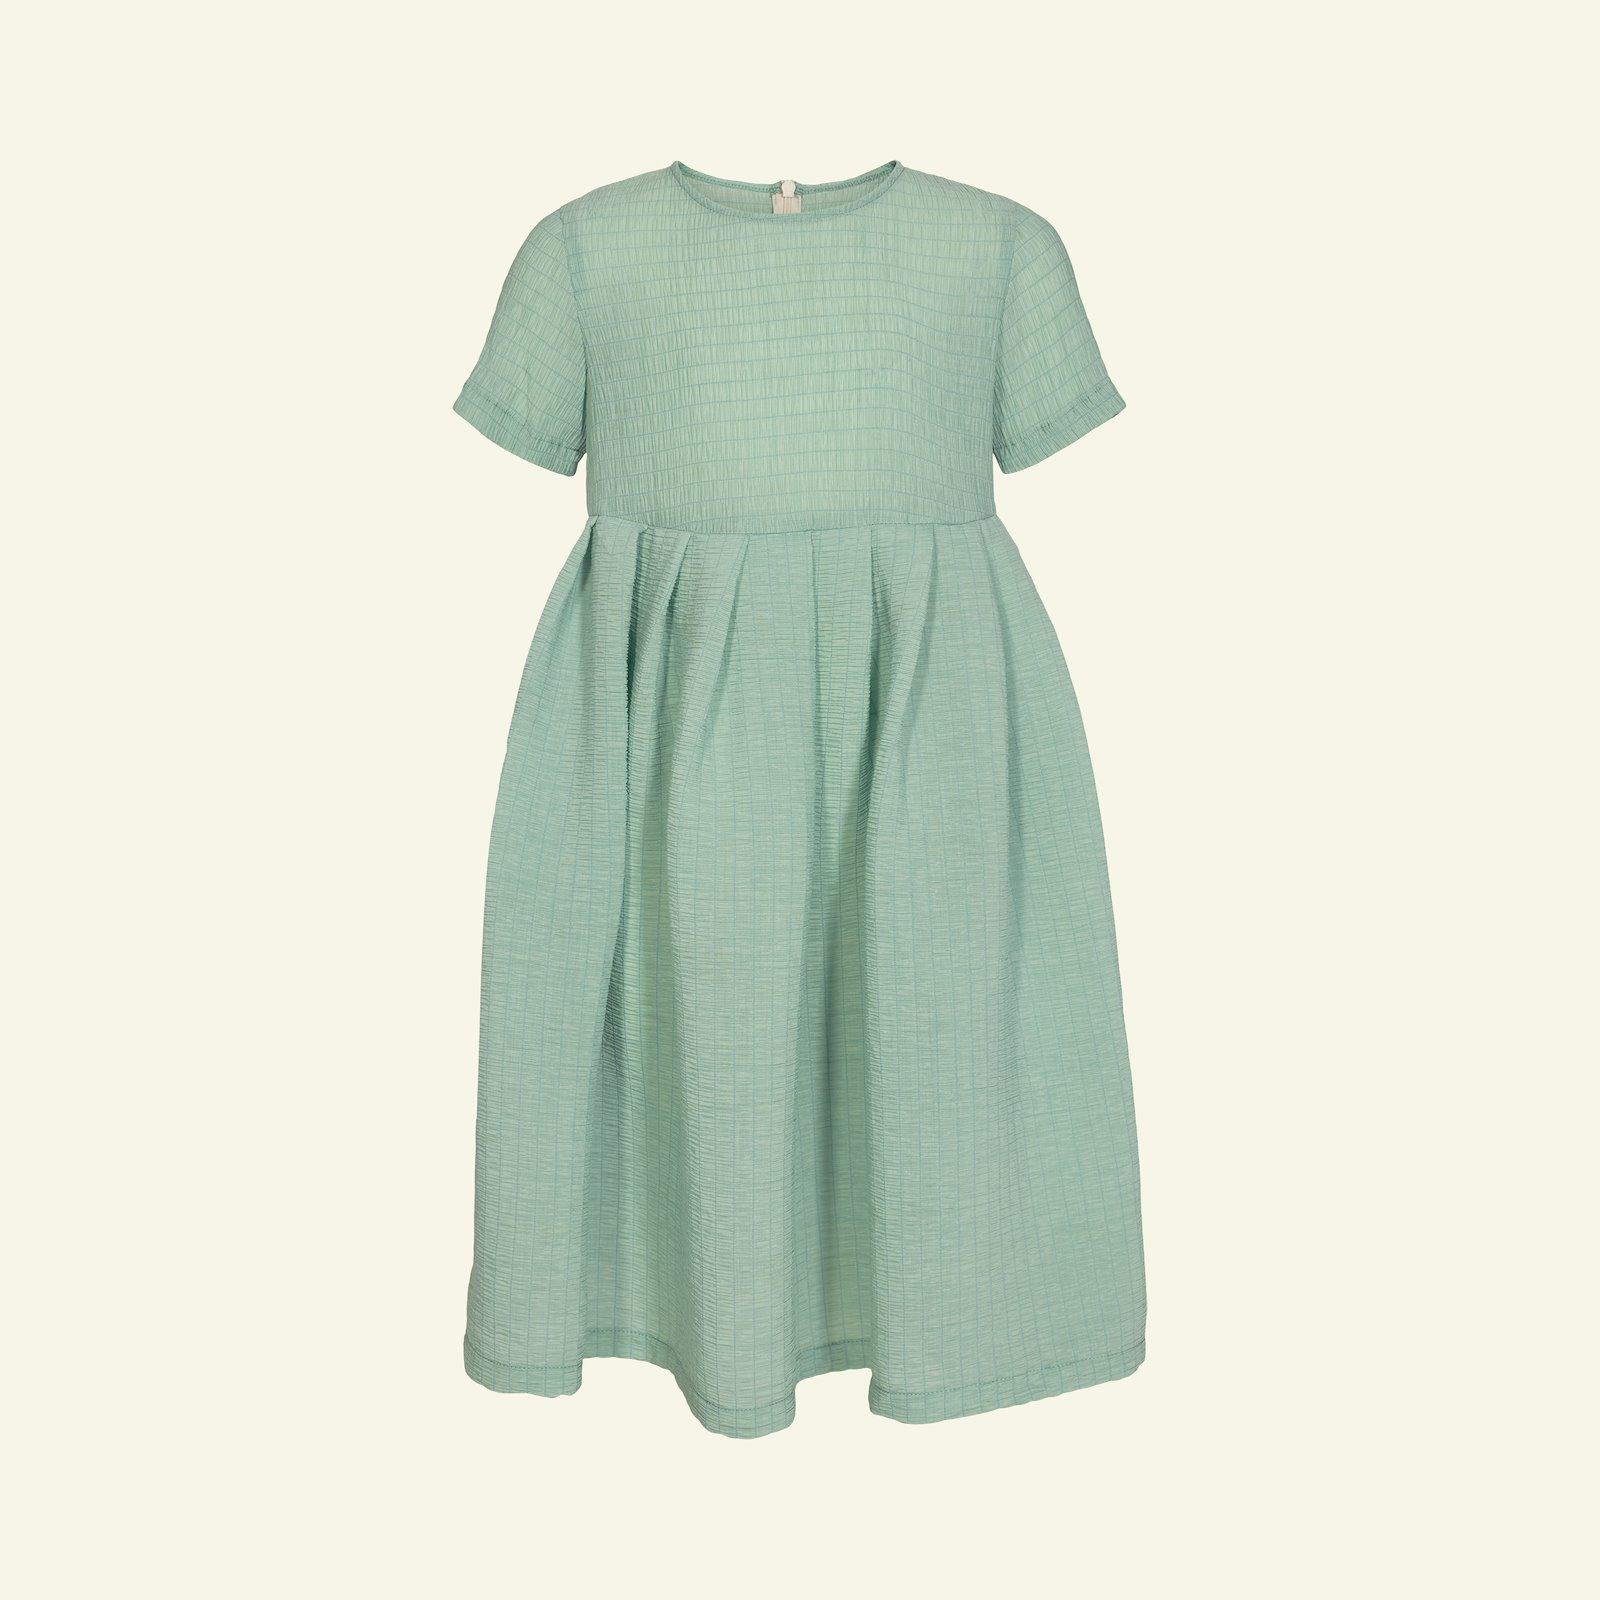 Dress, 122/7y p63059_560261_sskit